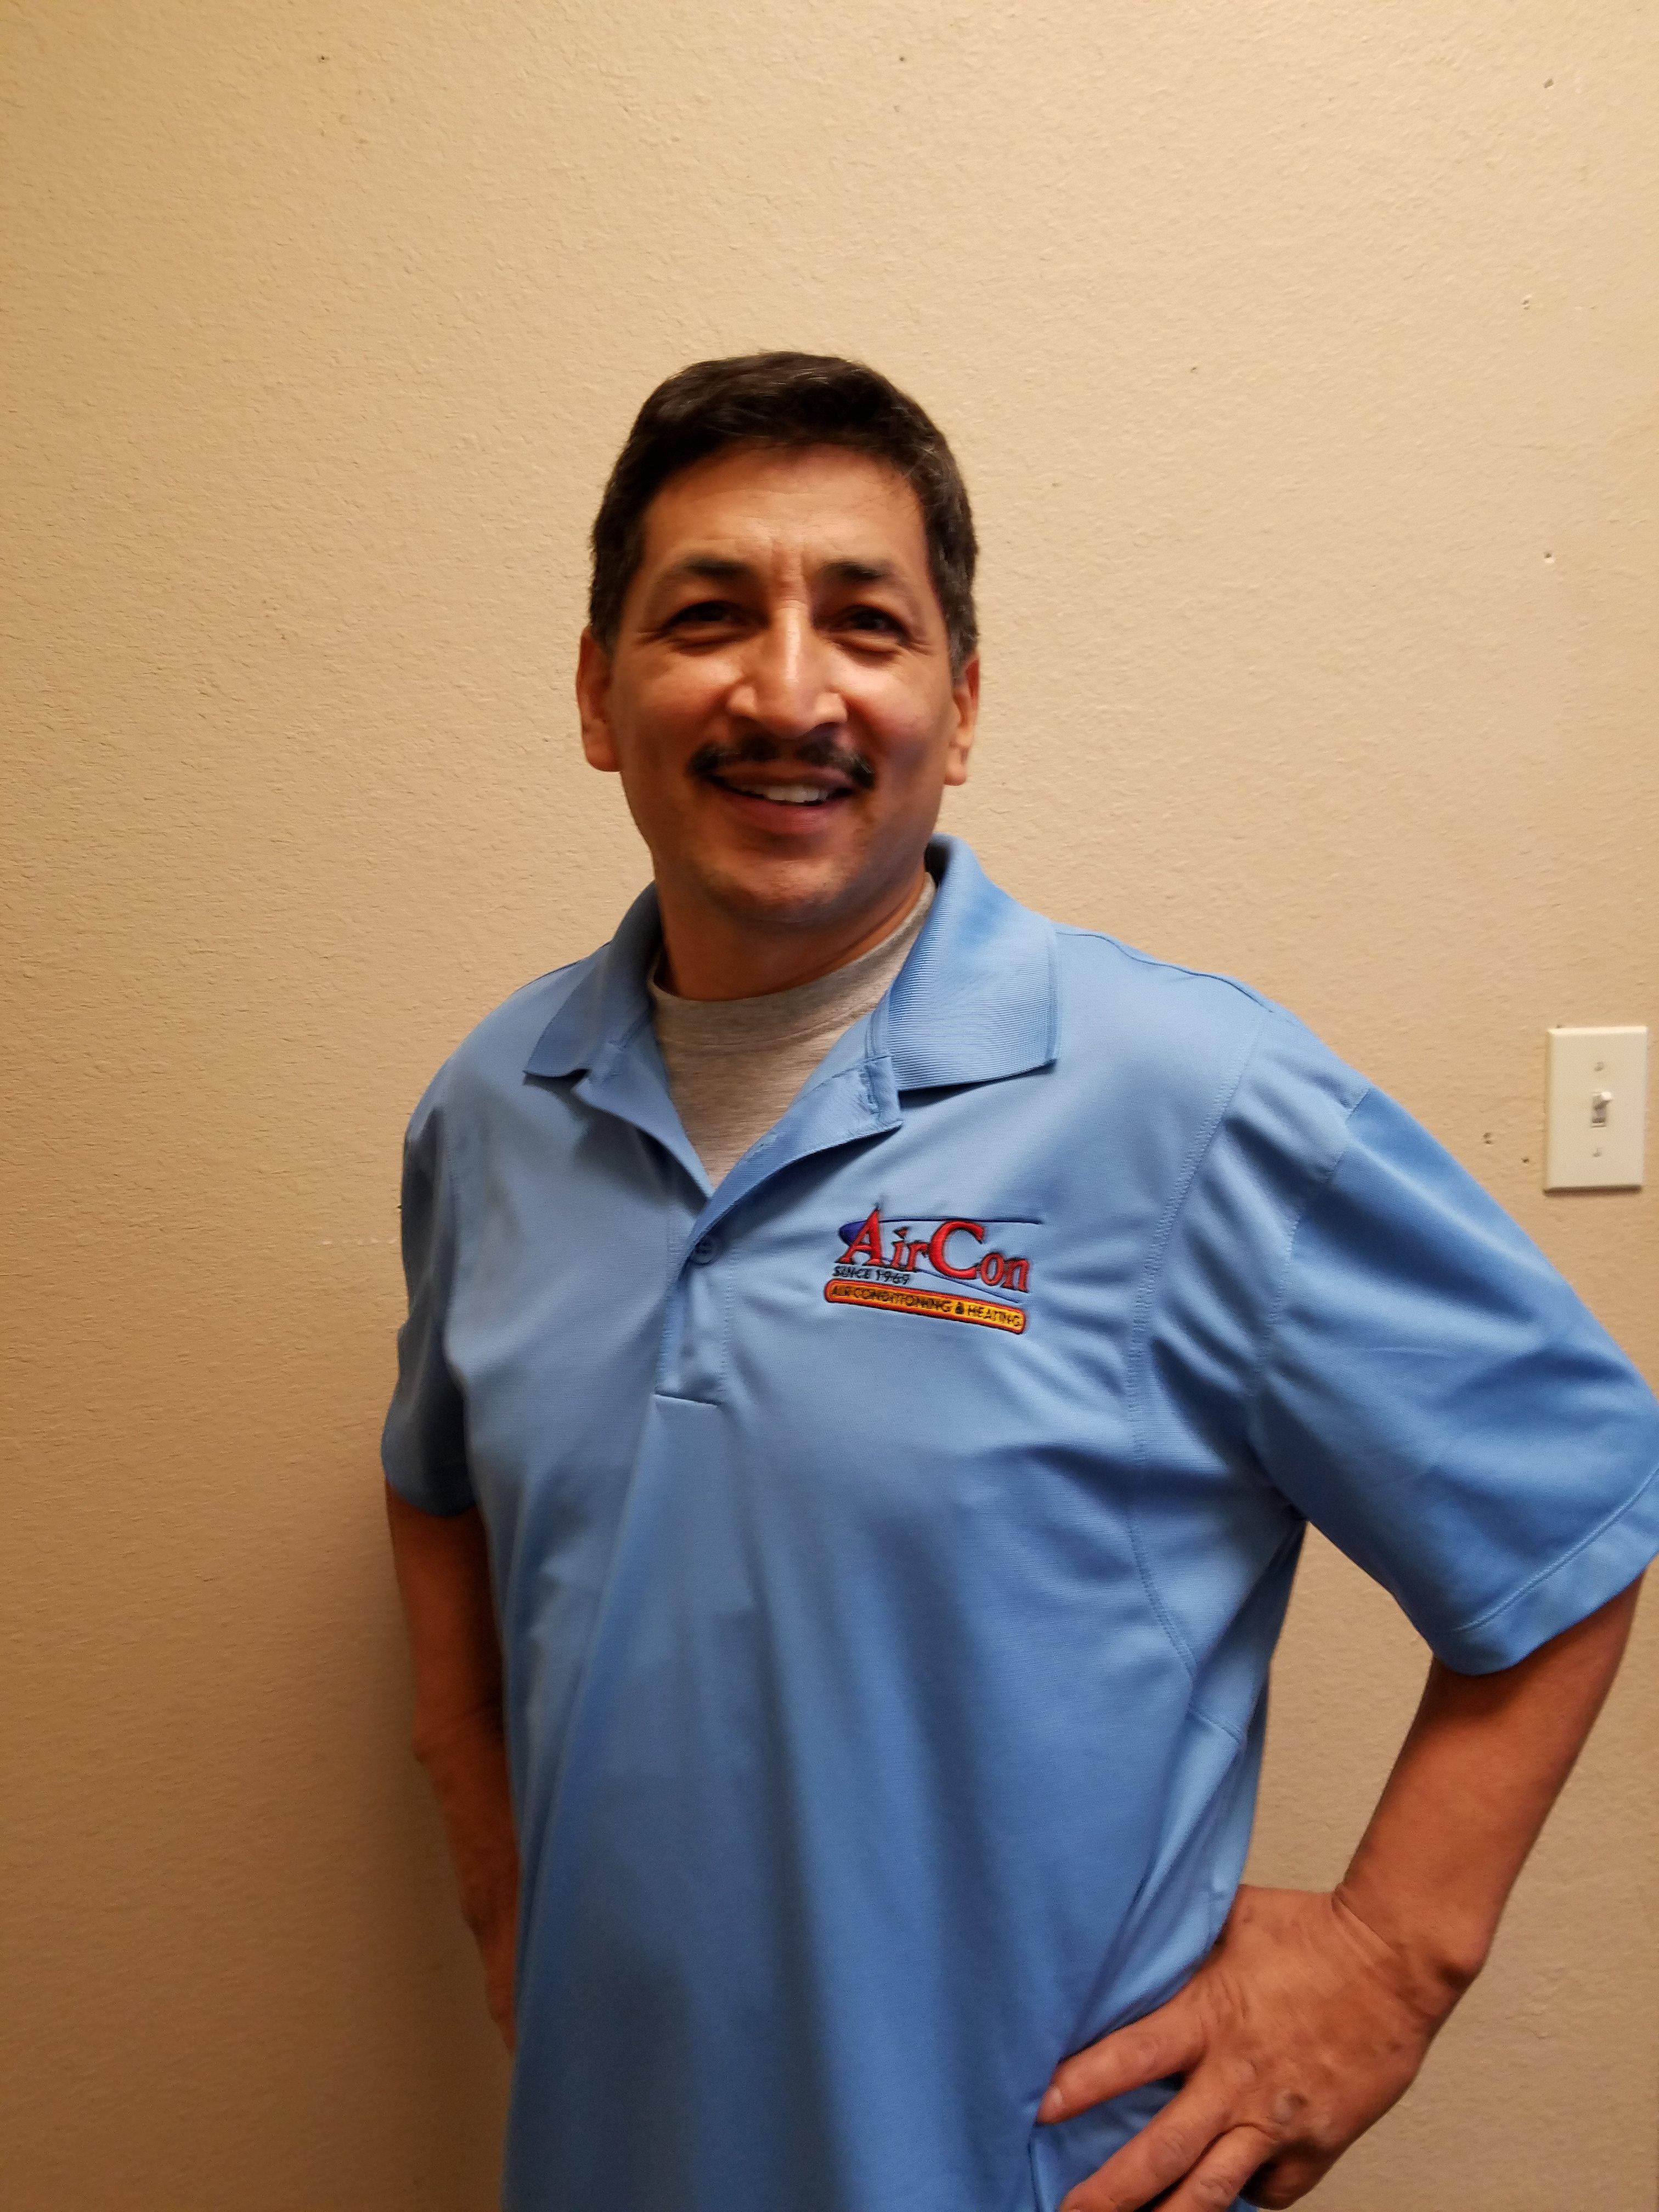 Hector | HVAC Installer, AirCon Service Company